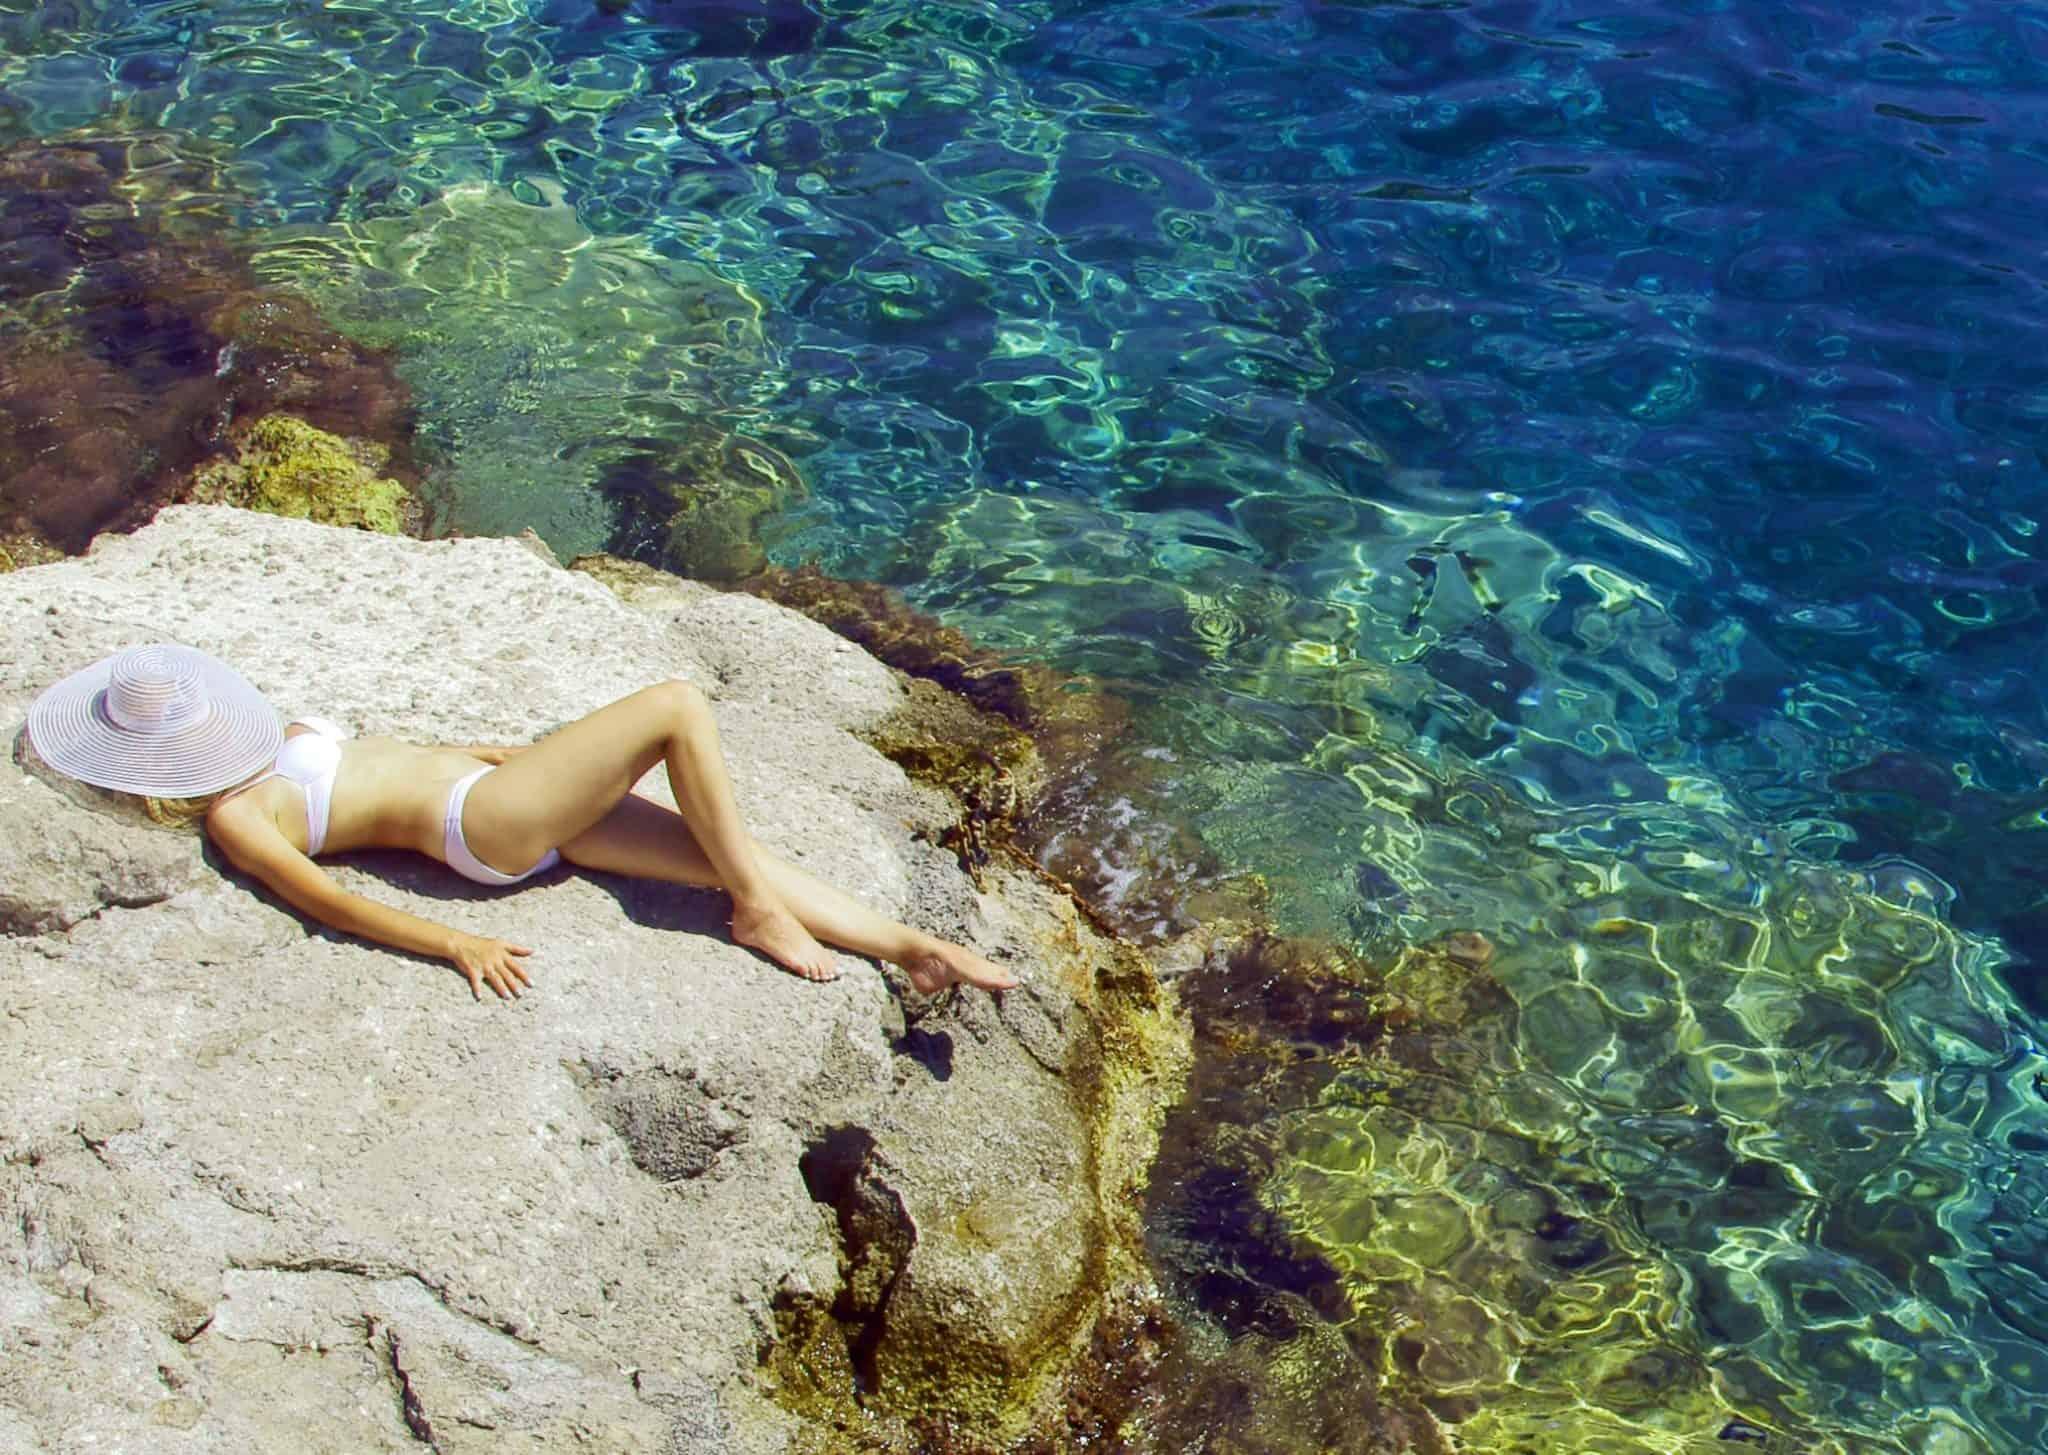 Prezzi Vacanze Barca a Vela